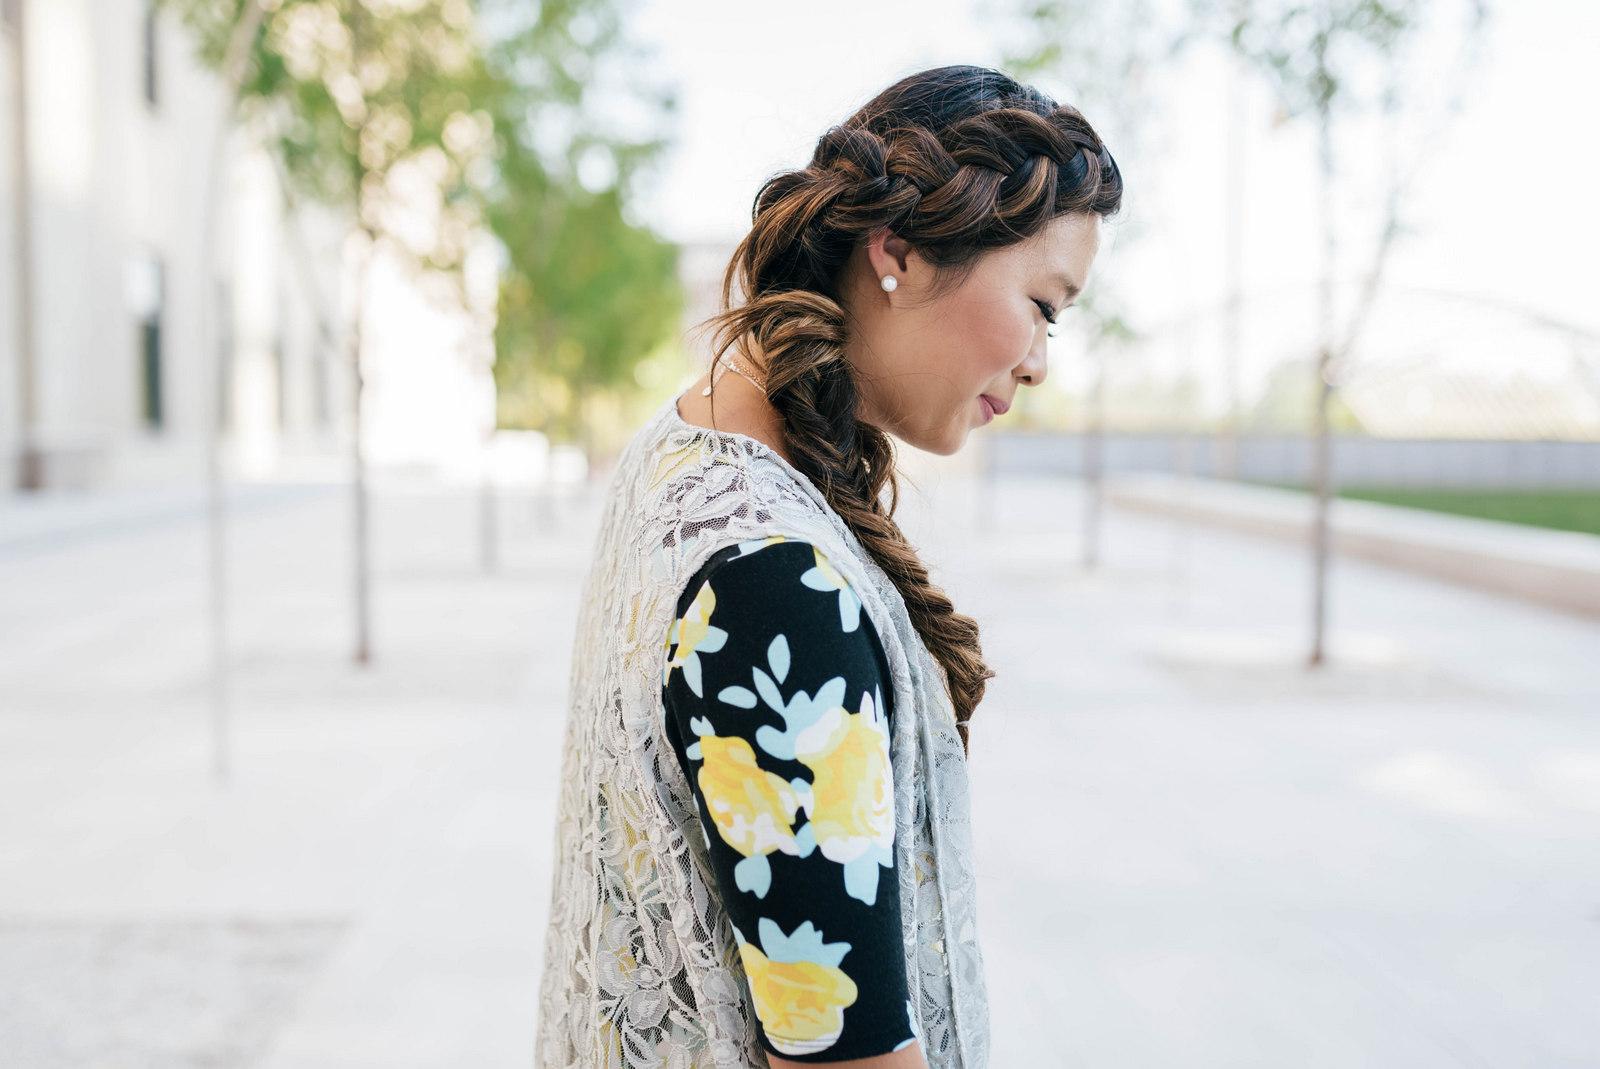 Side braid hairstyle